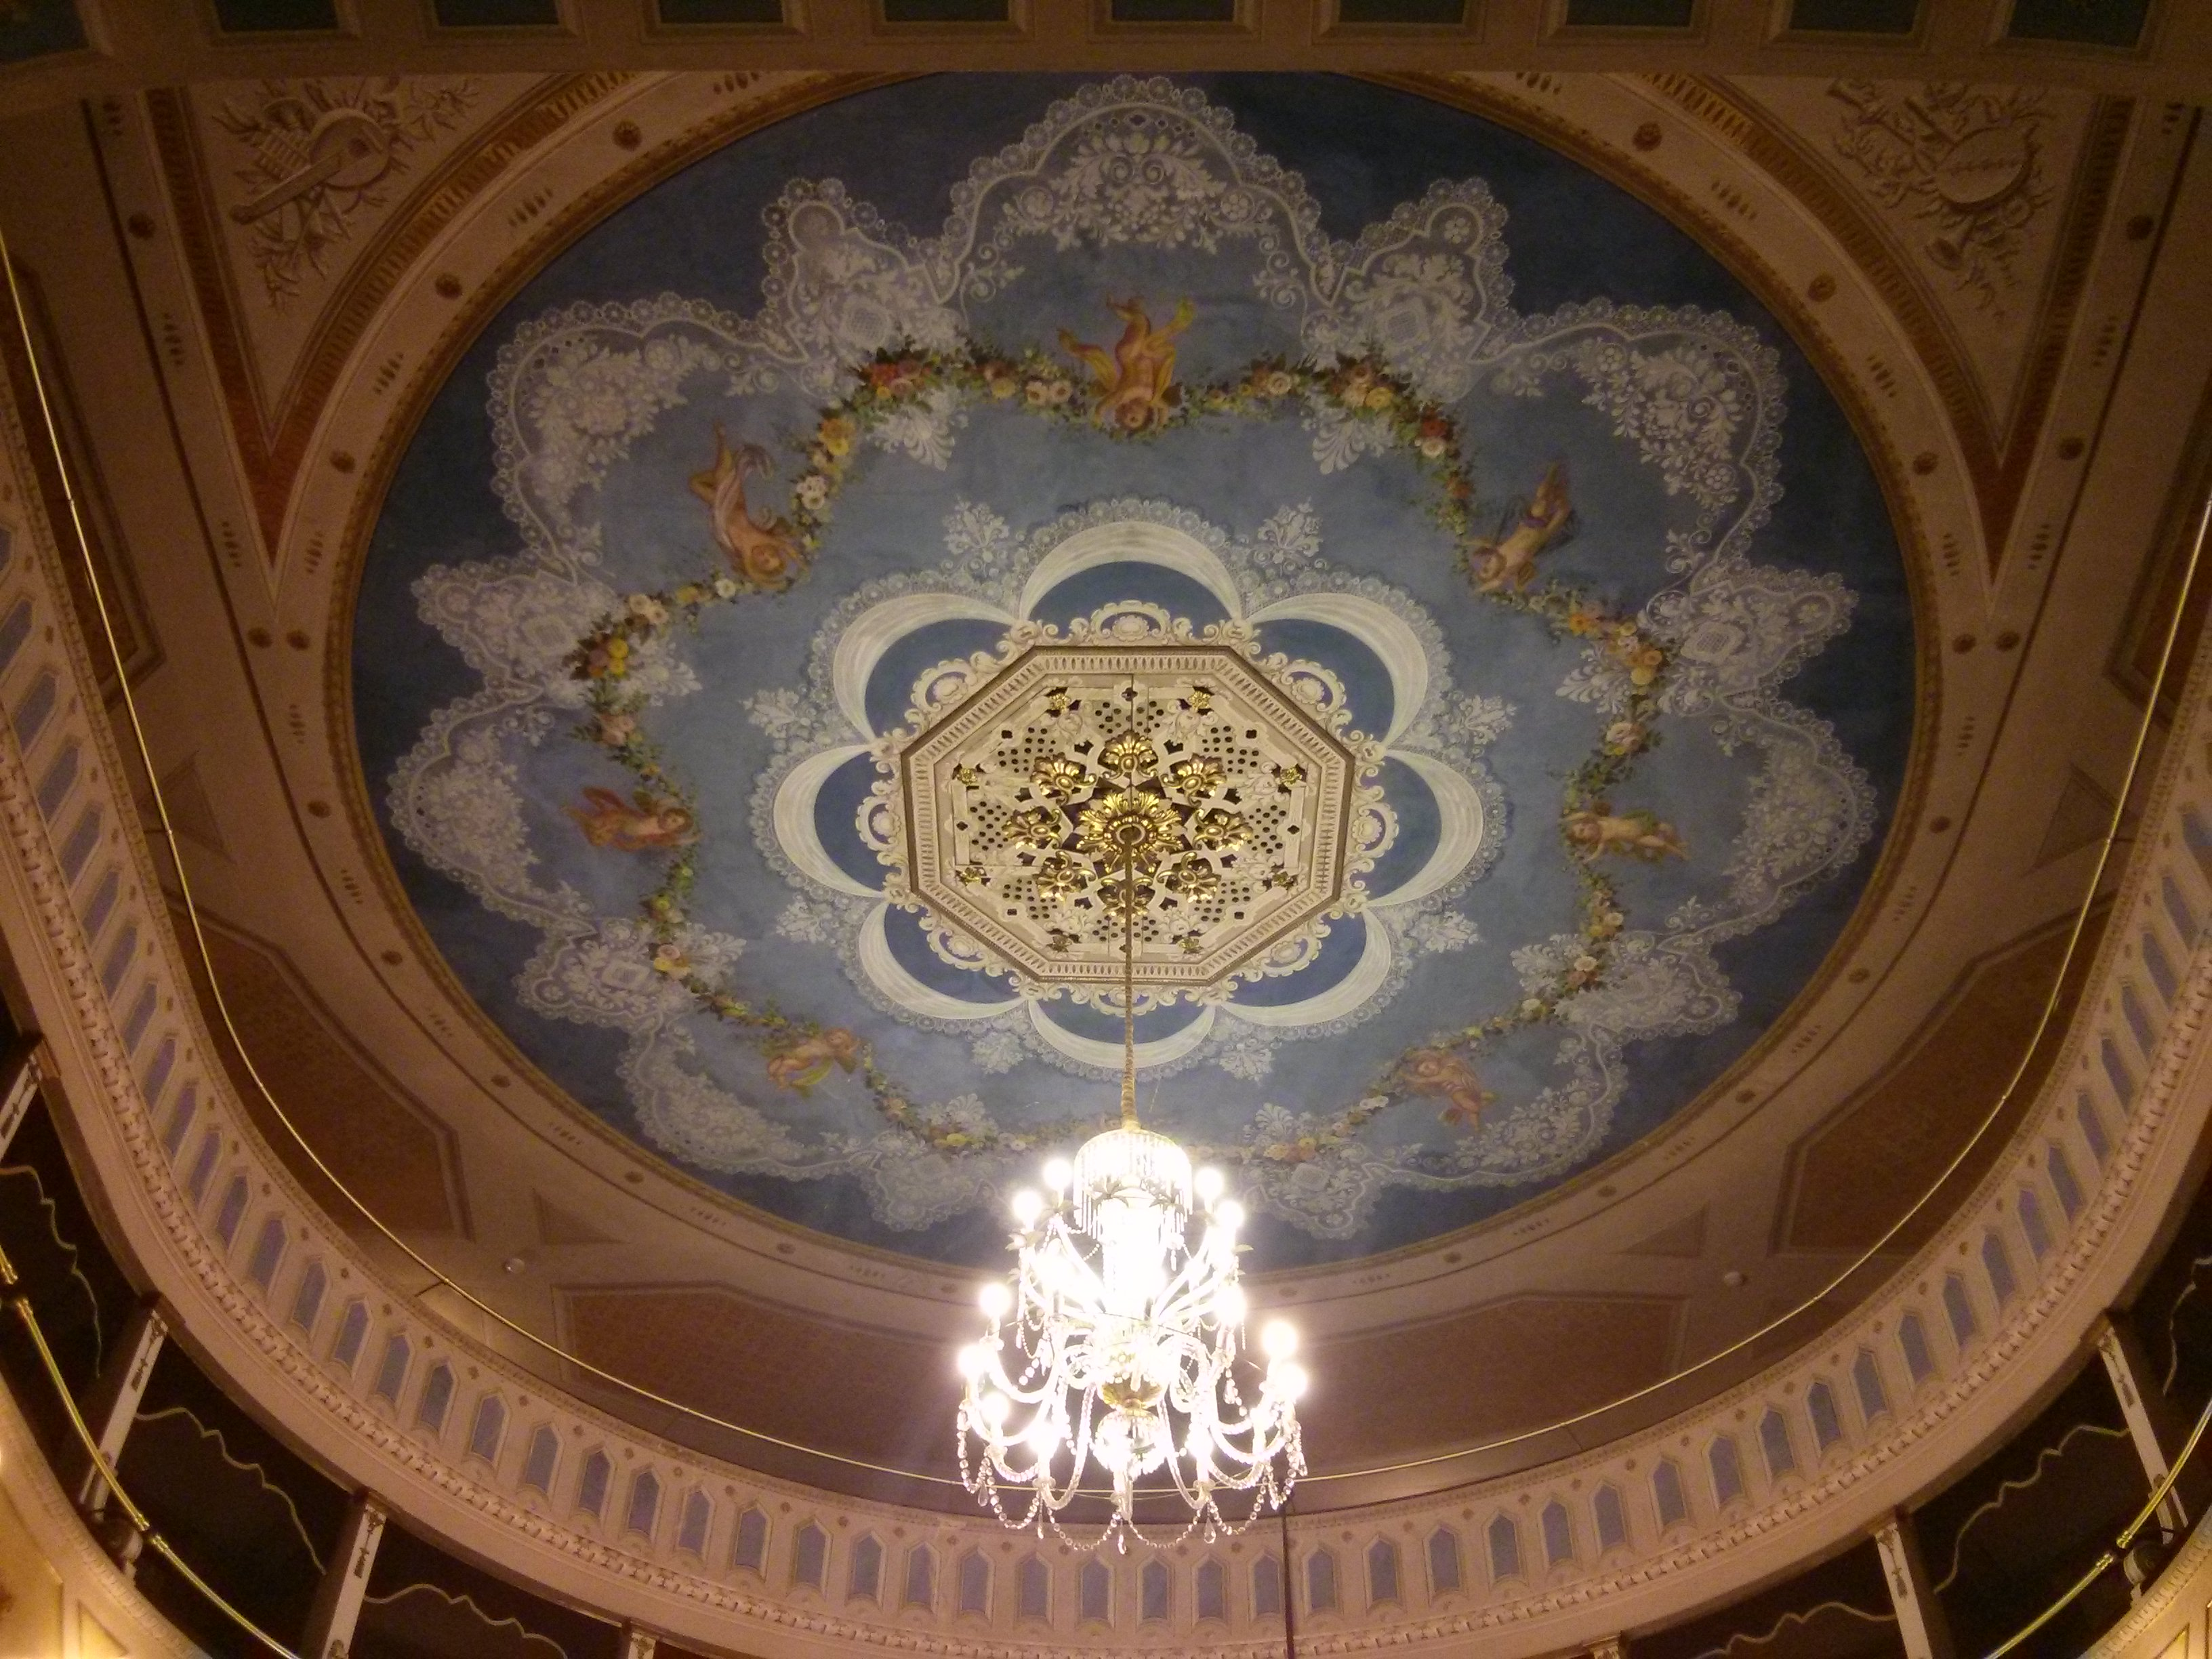 Teatro_carlo_goldoni__corinaldo__soffitto